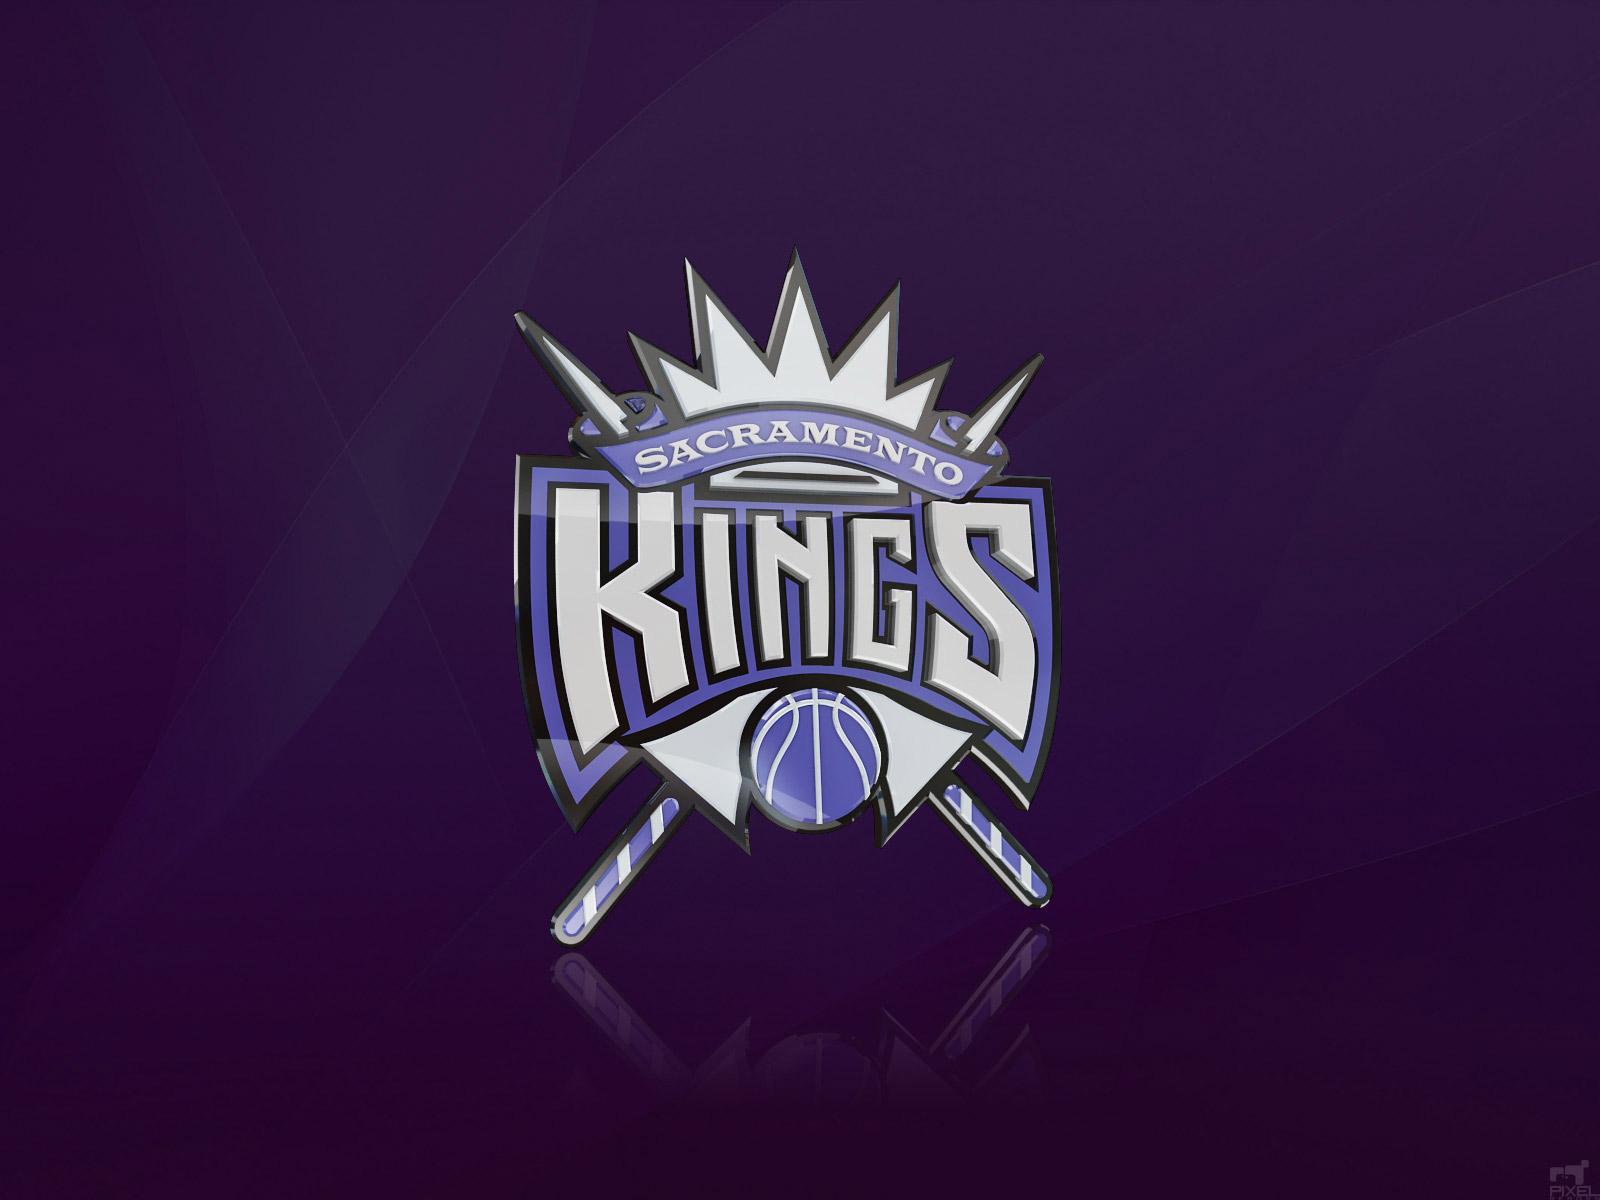 Sport Logo Iphone Wallpaper: NBA Wallpapers For IPhone 5